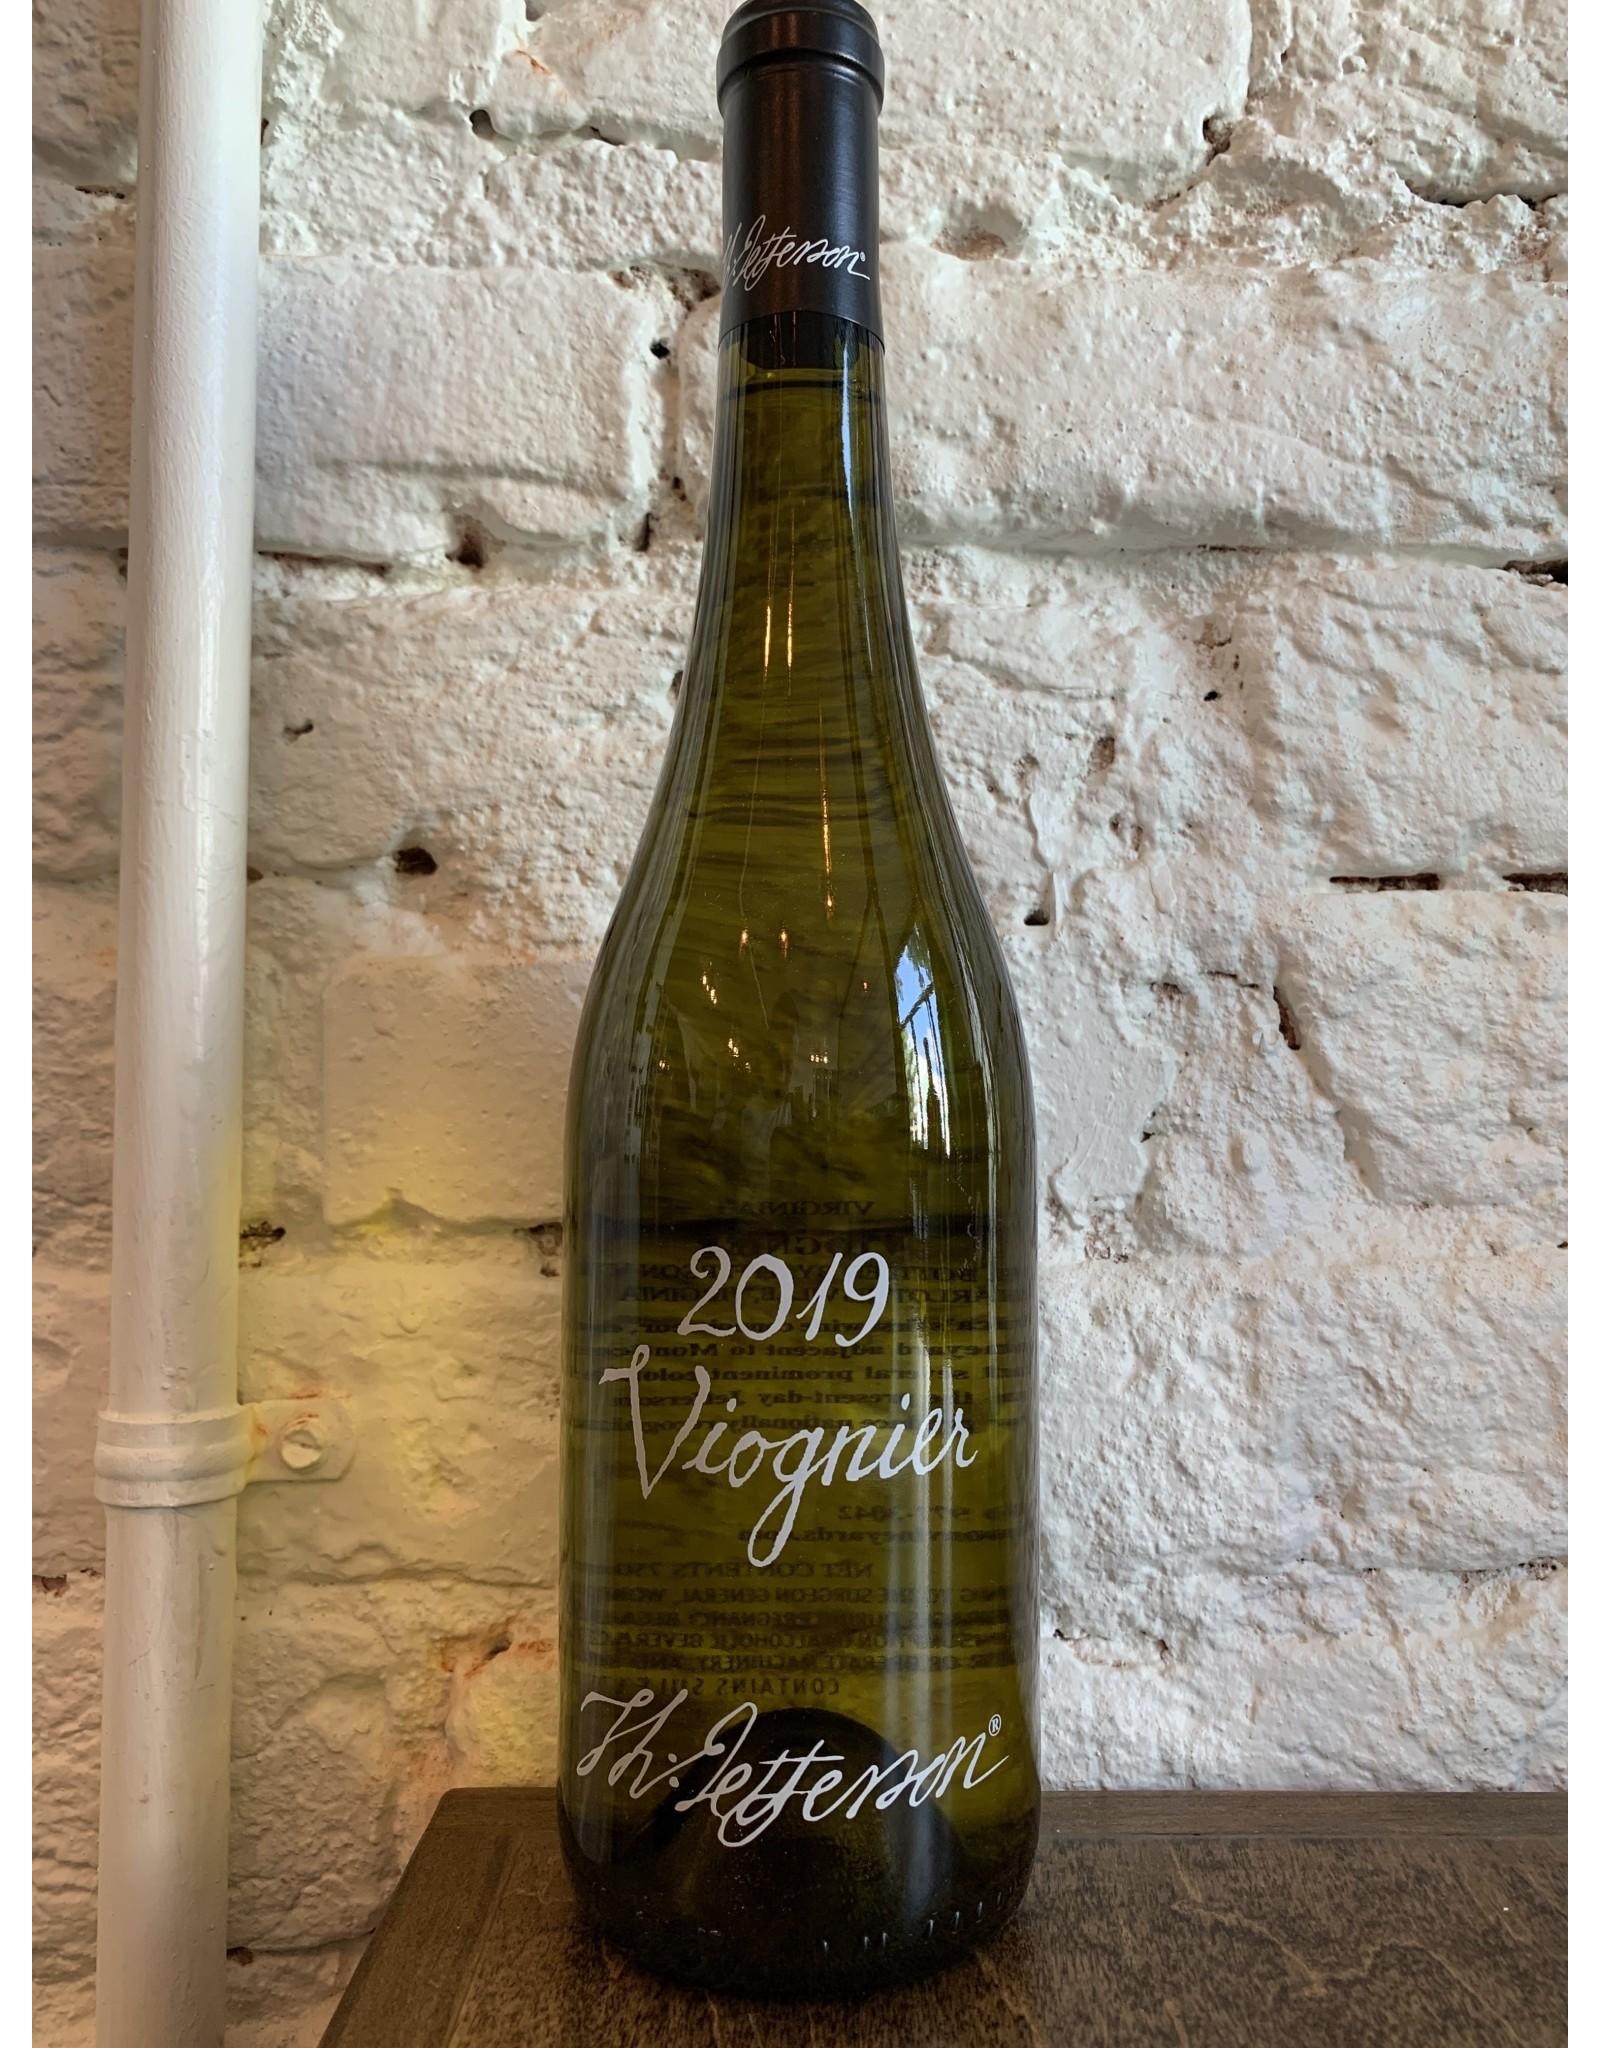 Jefferson Jefferson Vineyards, Viognier 2019